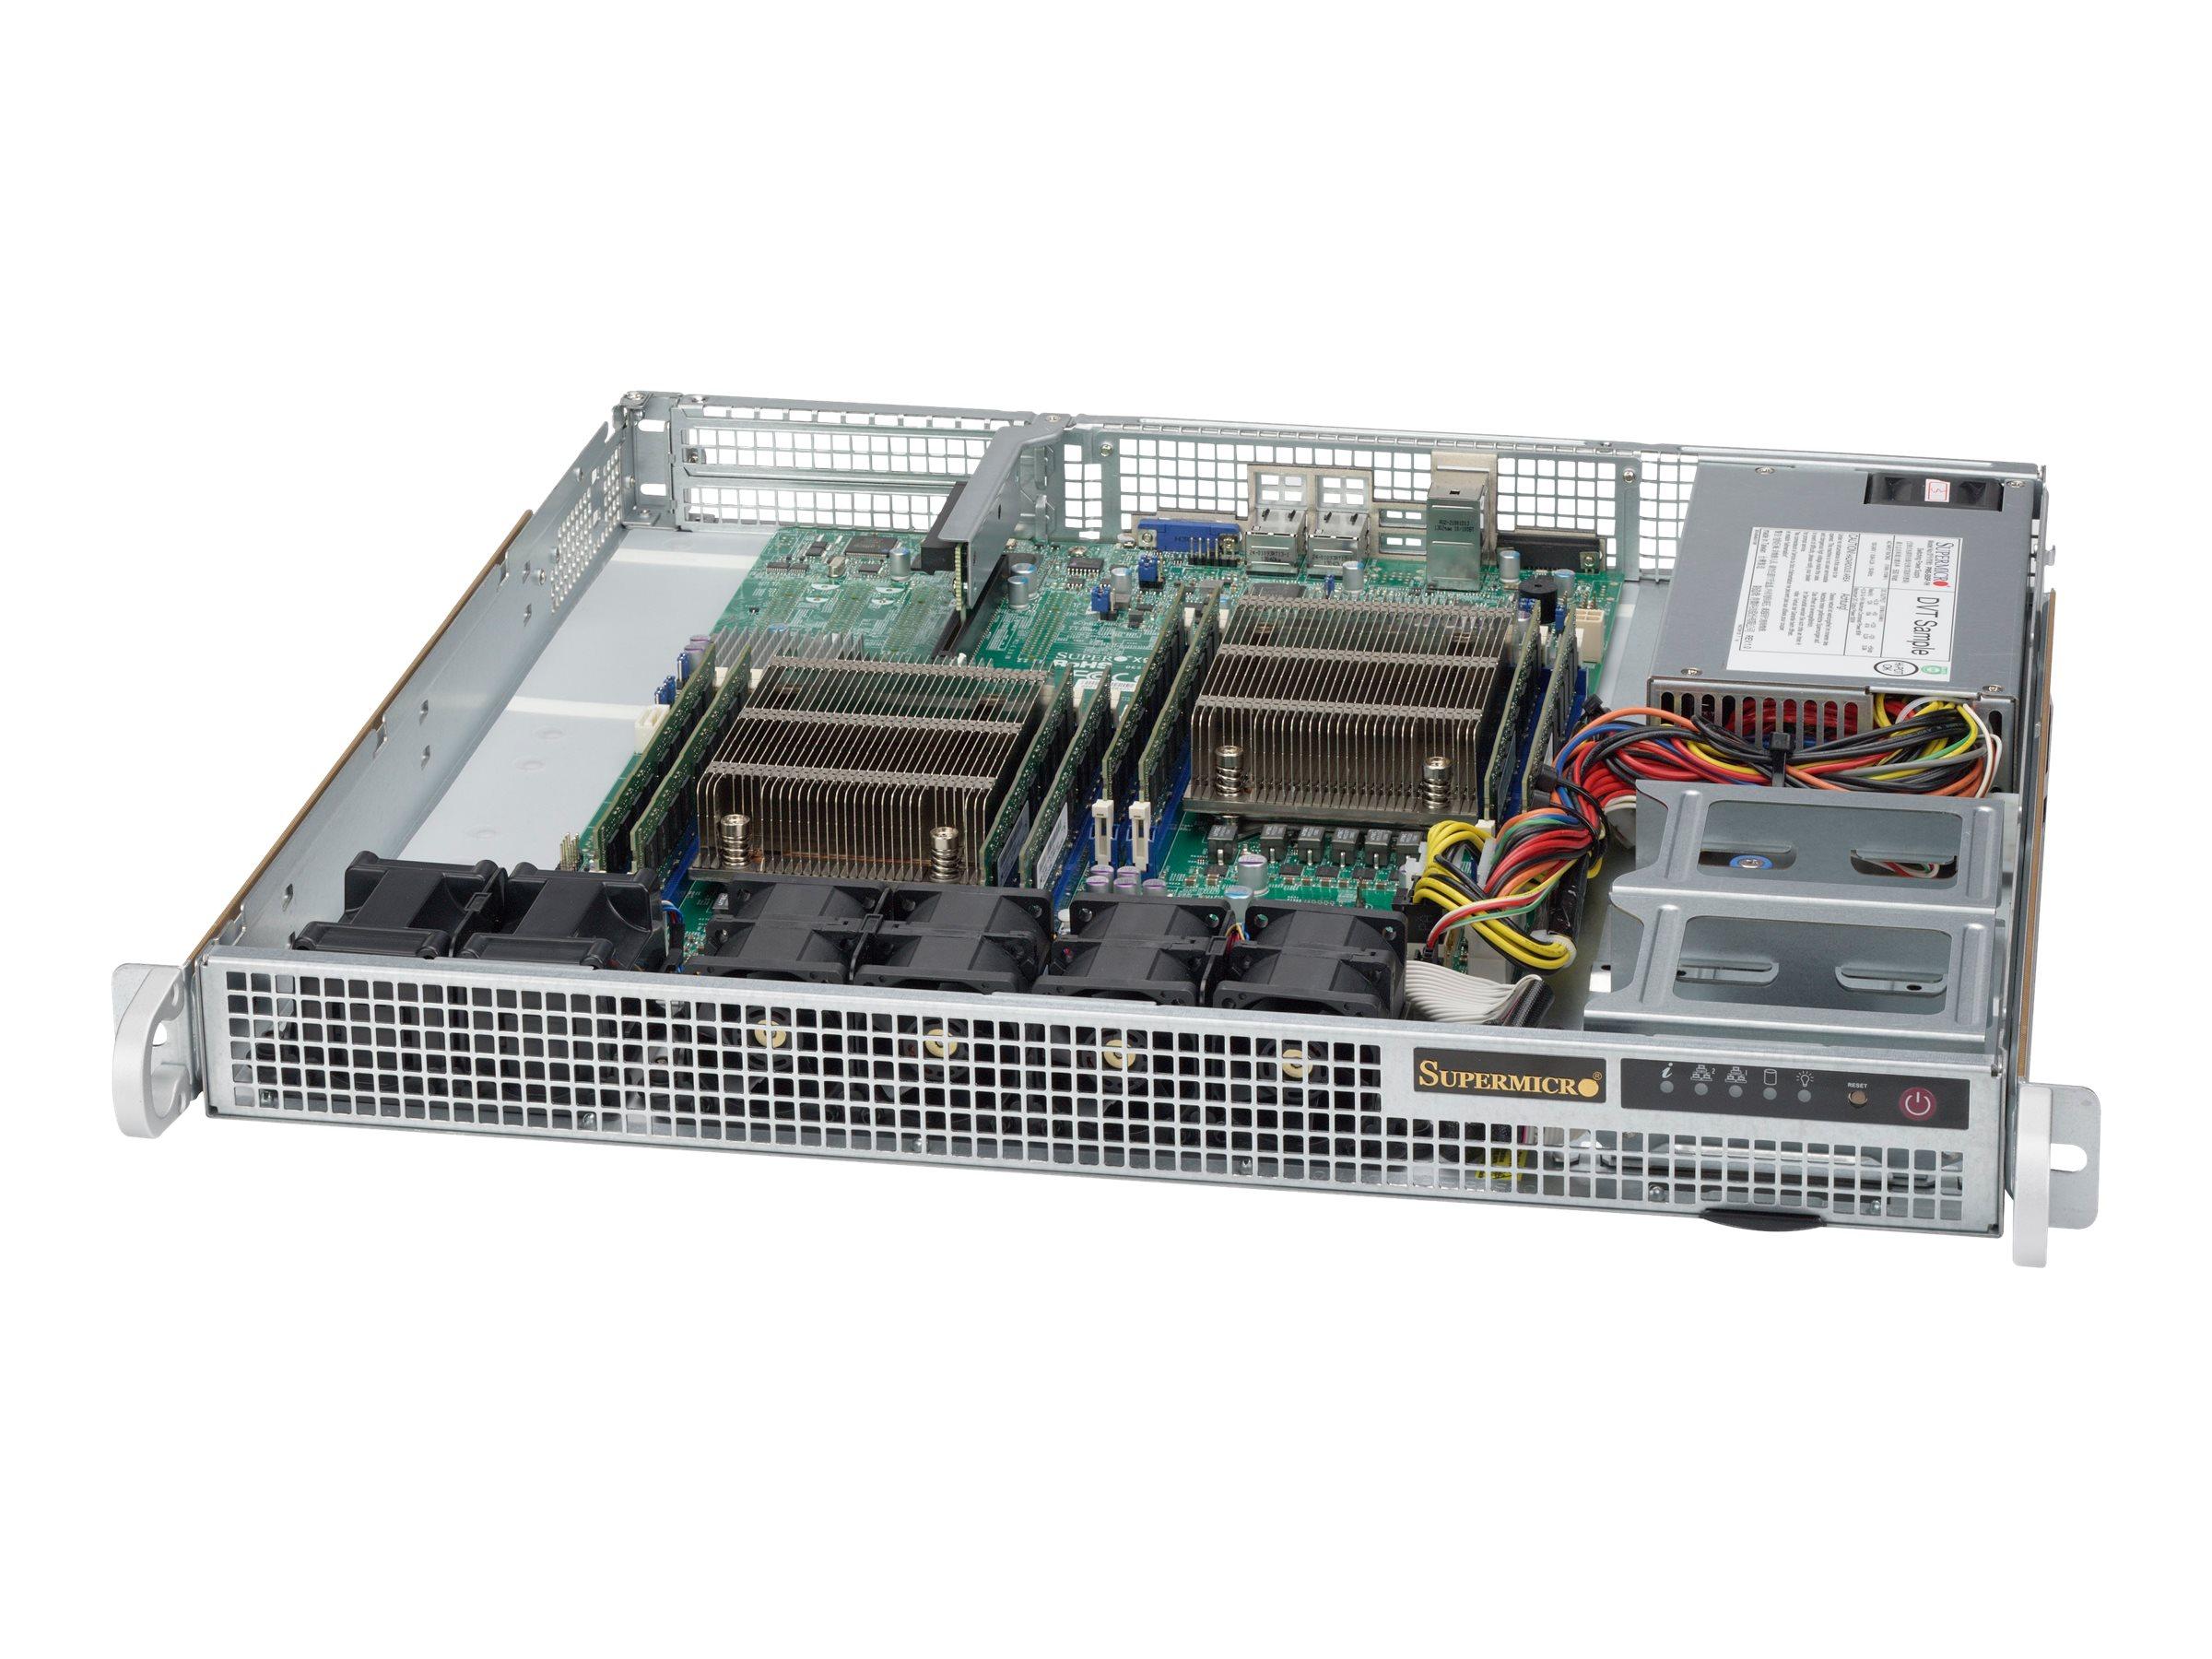 Supermicro SC514 505 - Rack - einbaufähig - 1U - Erweitertes ATX - SATA/SAS